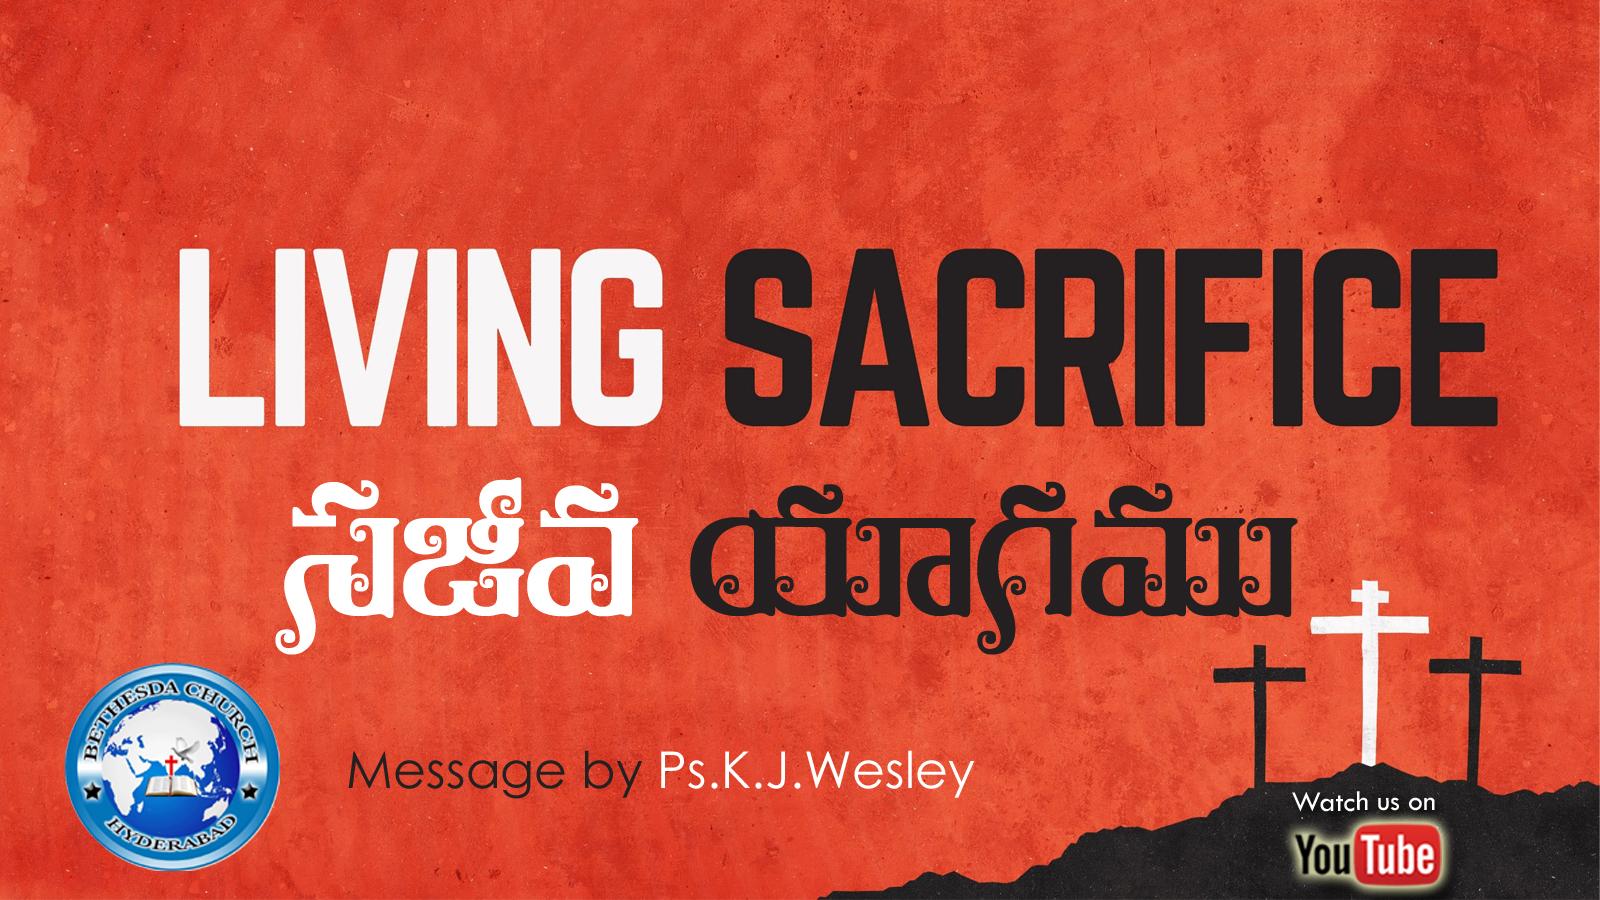 Living Sacrifice (A248)